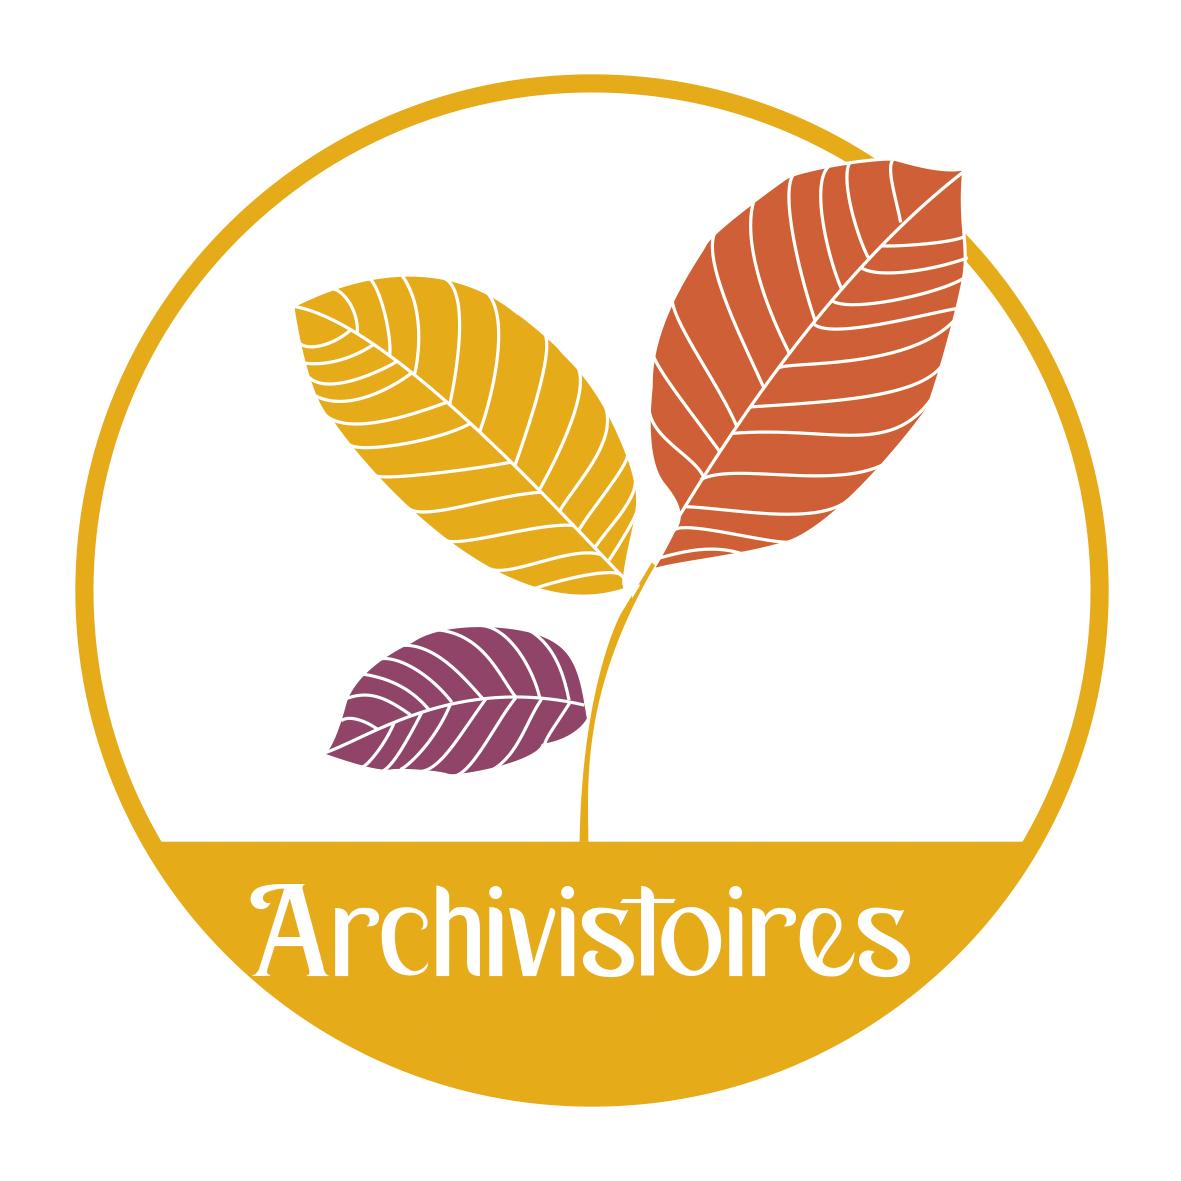 Archivistoires